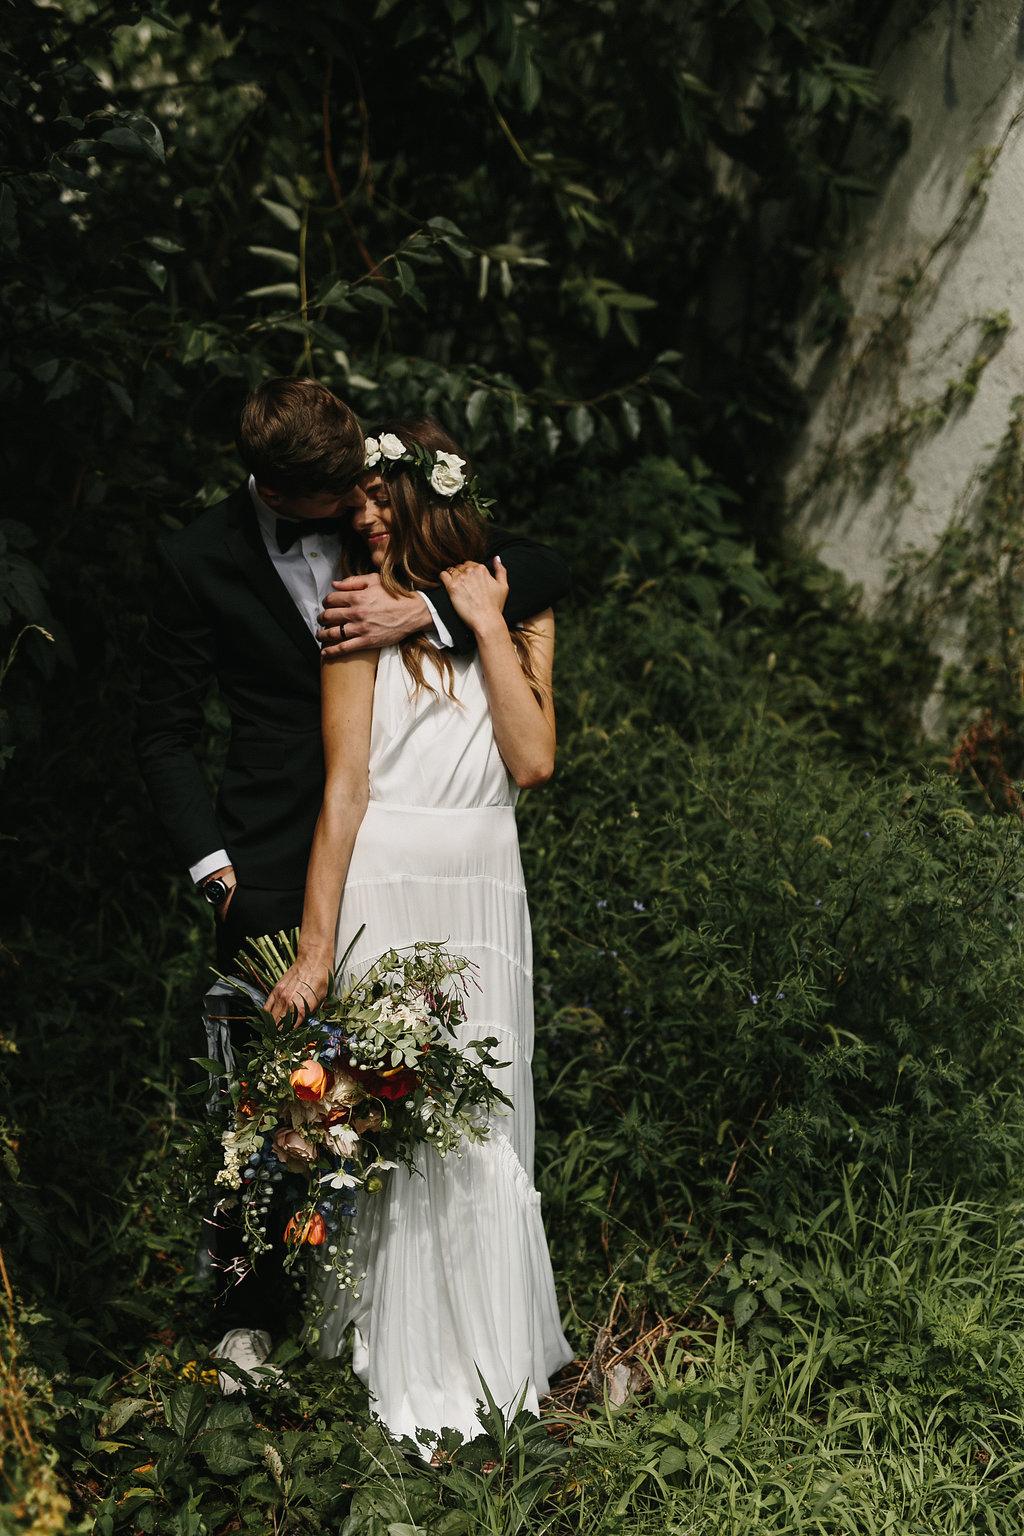 justin&emily-wedding-474.jpg